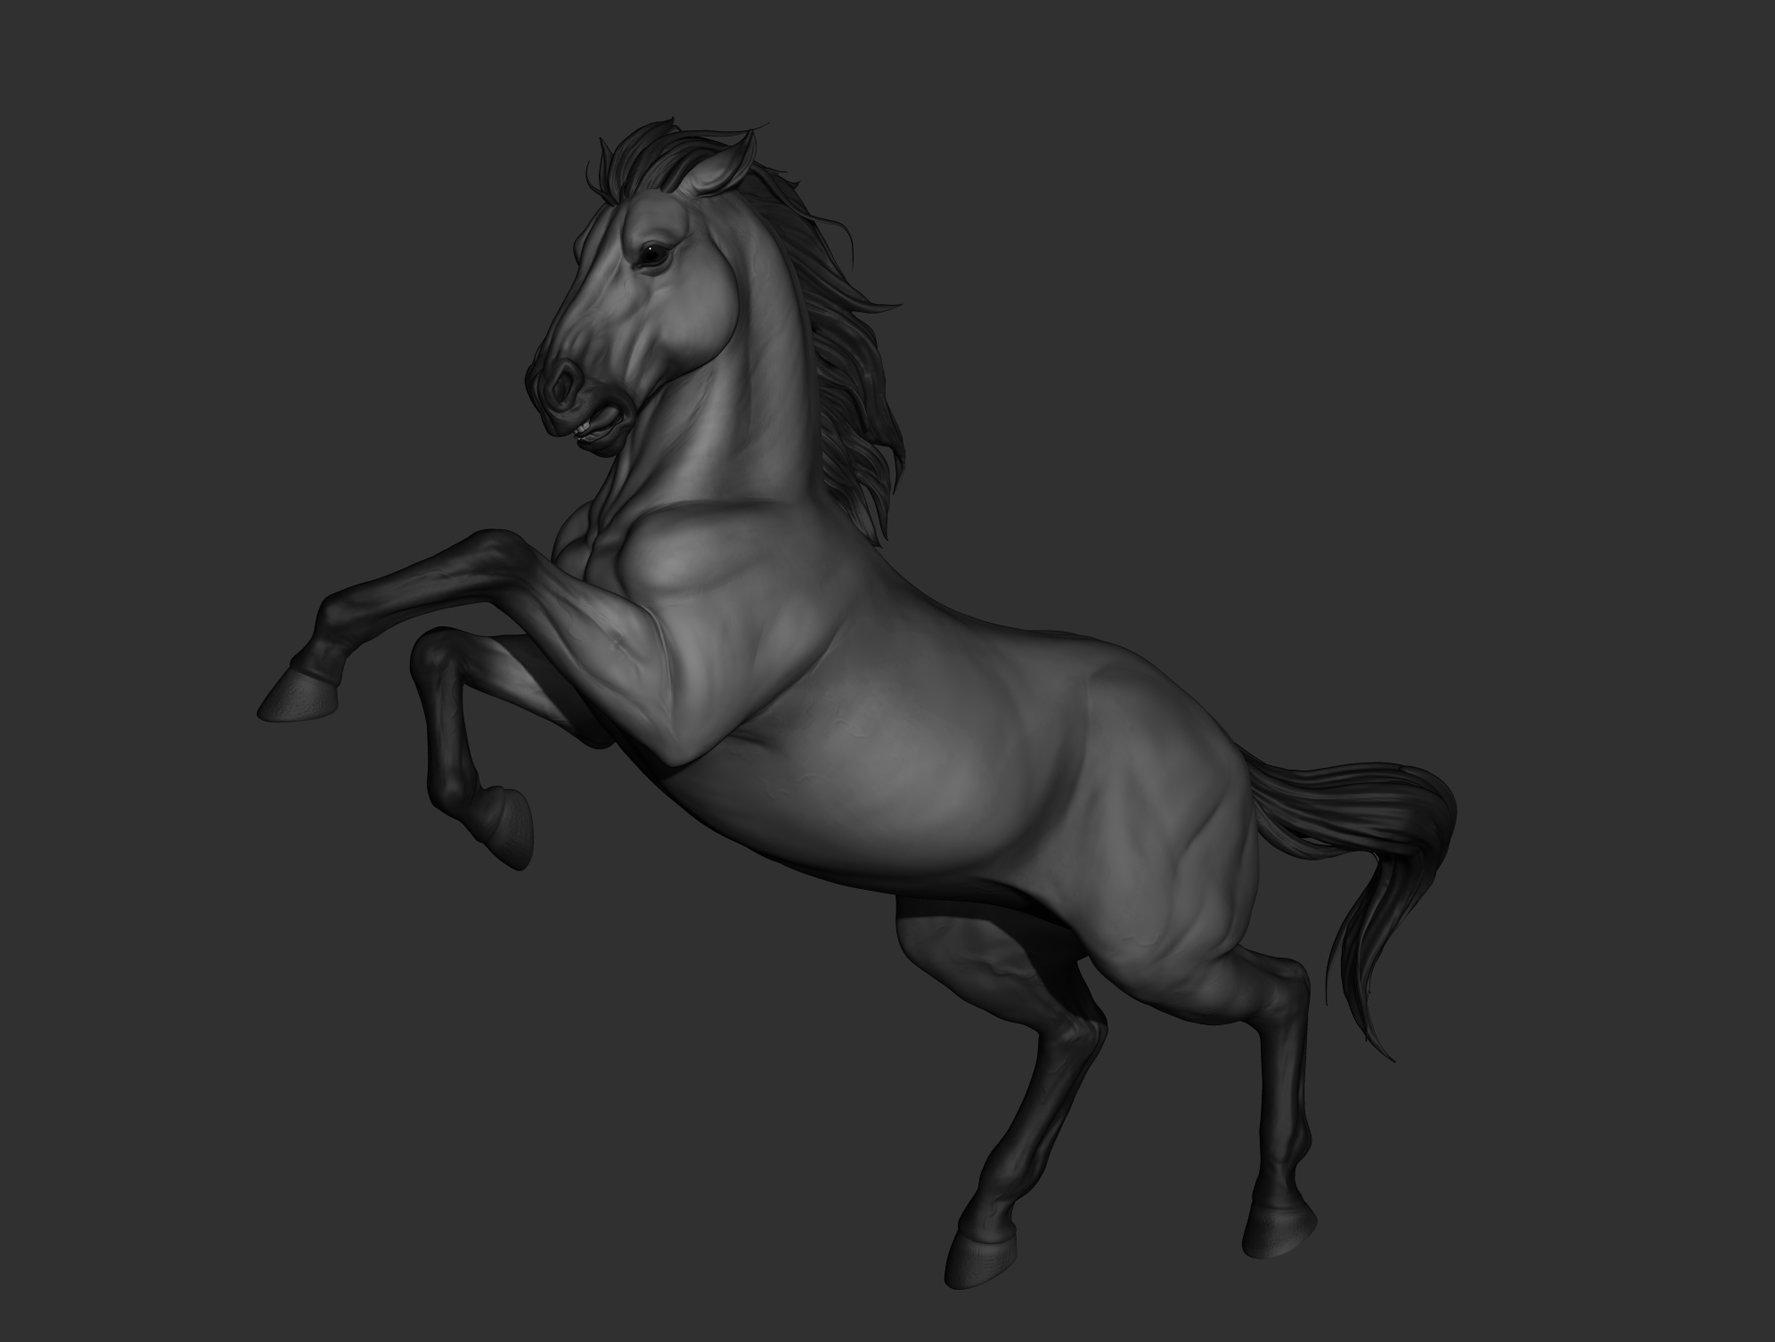 Krystal sae eua horse02